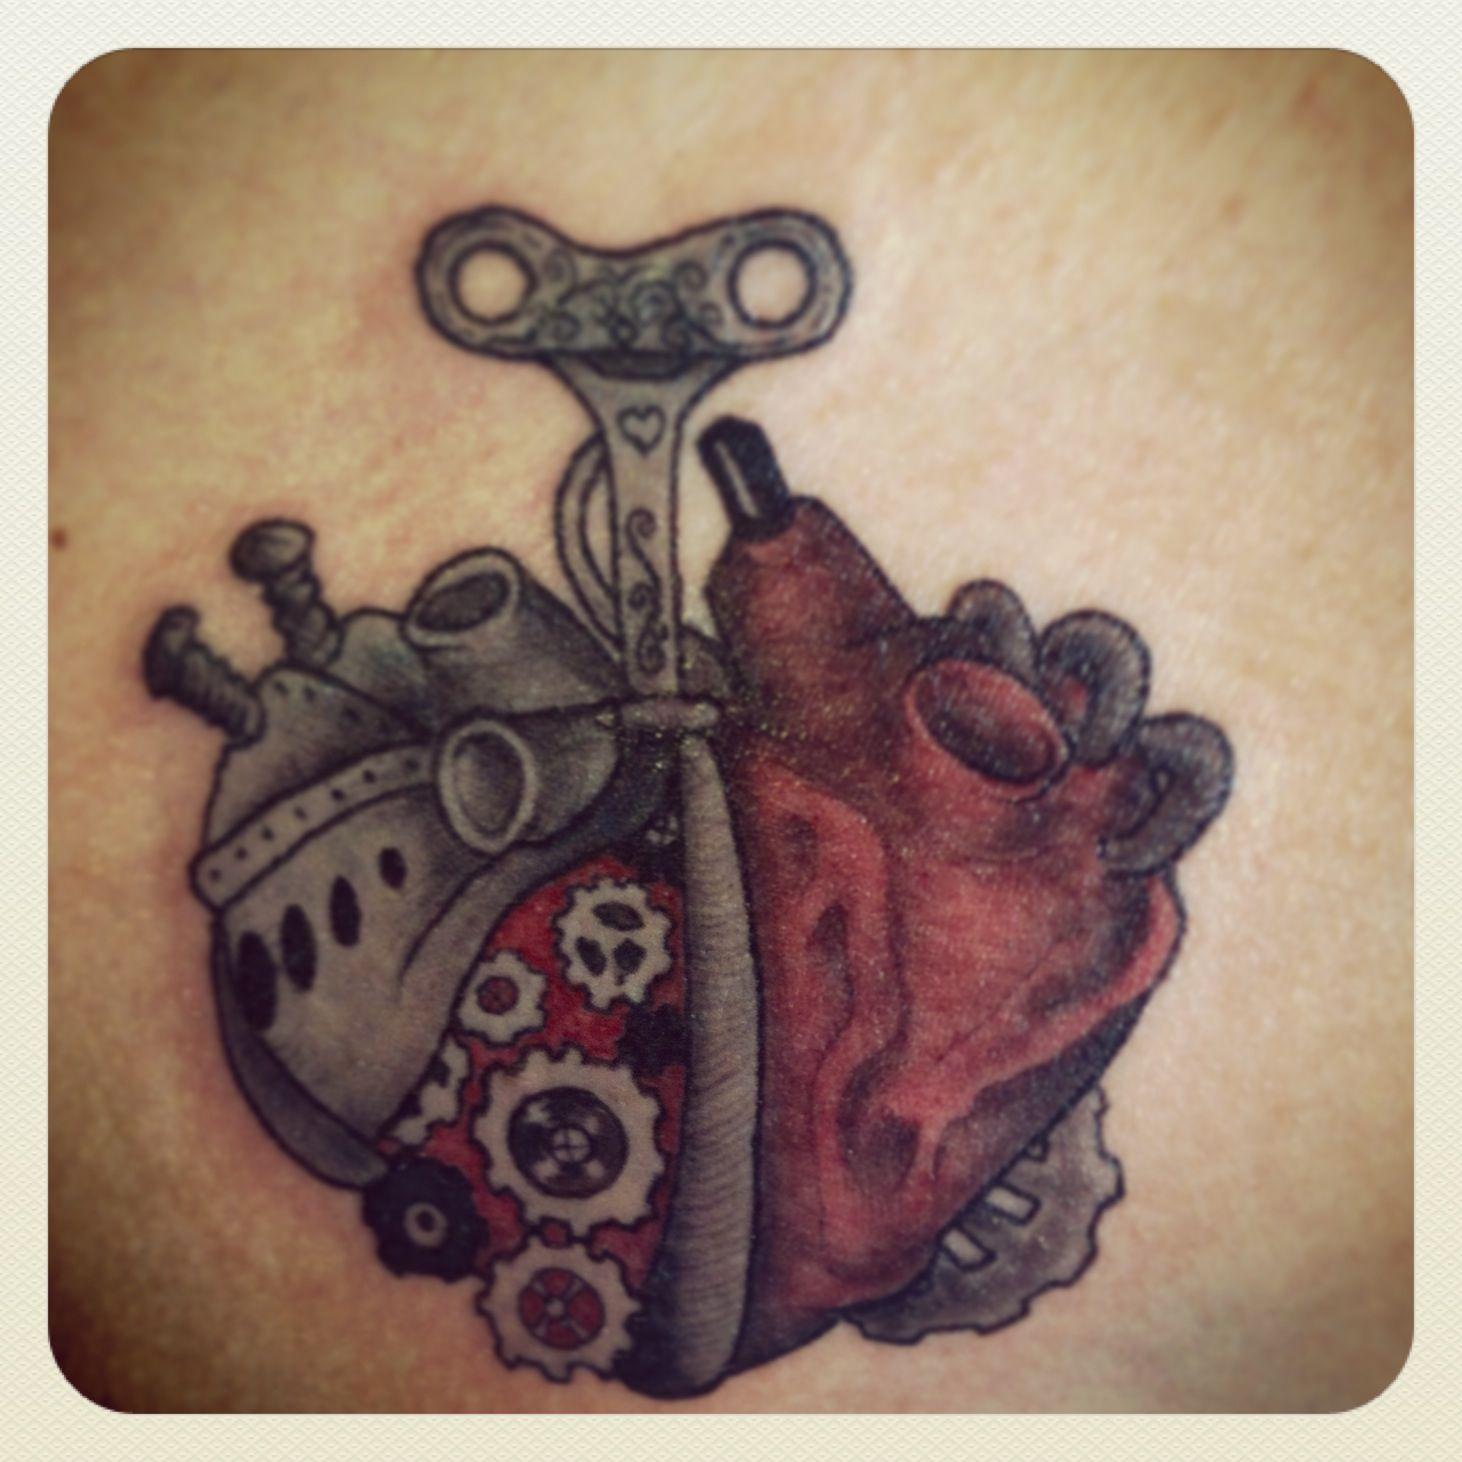 Bio Mechanical Heart Tattoo Steampunk Style Tattoo Bio Mech Mechanical Steampunk Tattoos Heart Tattoo Steampunk Heart Heart Tattoo Designs